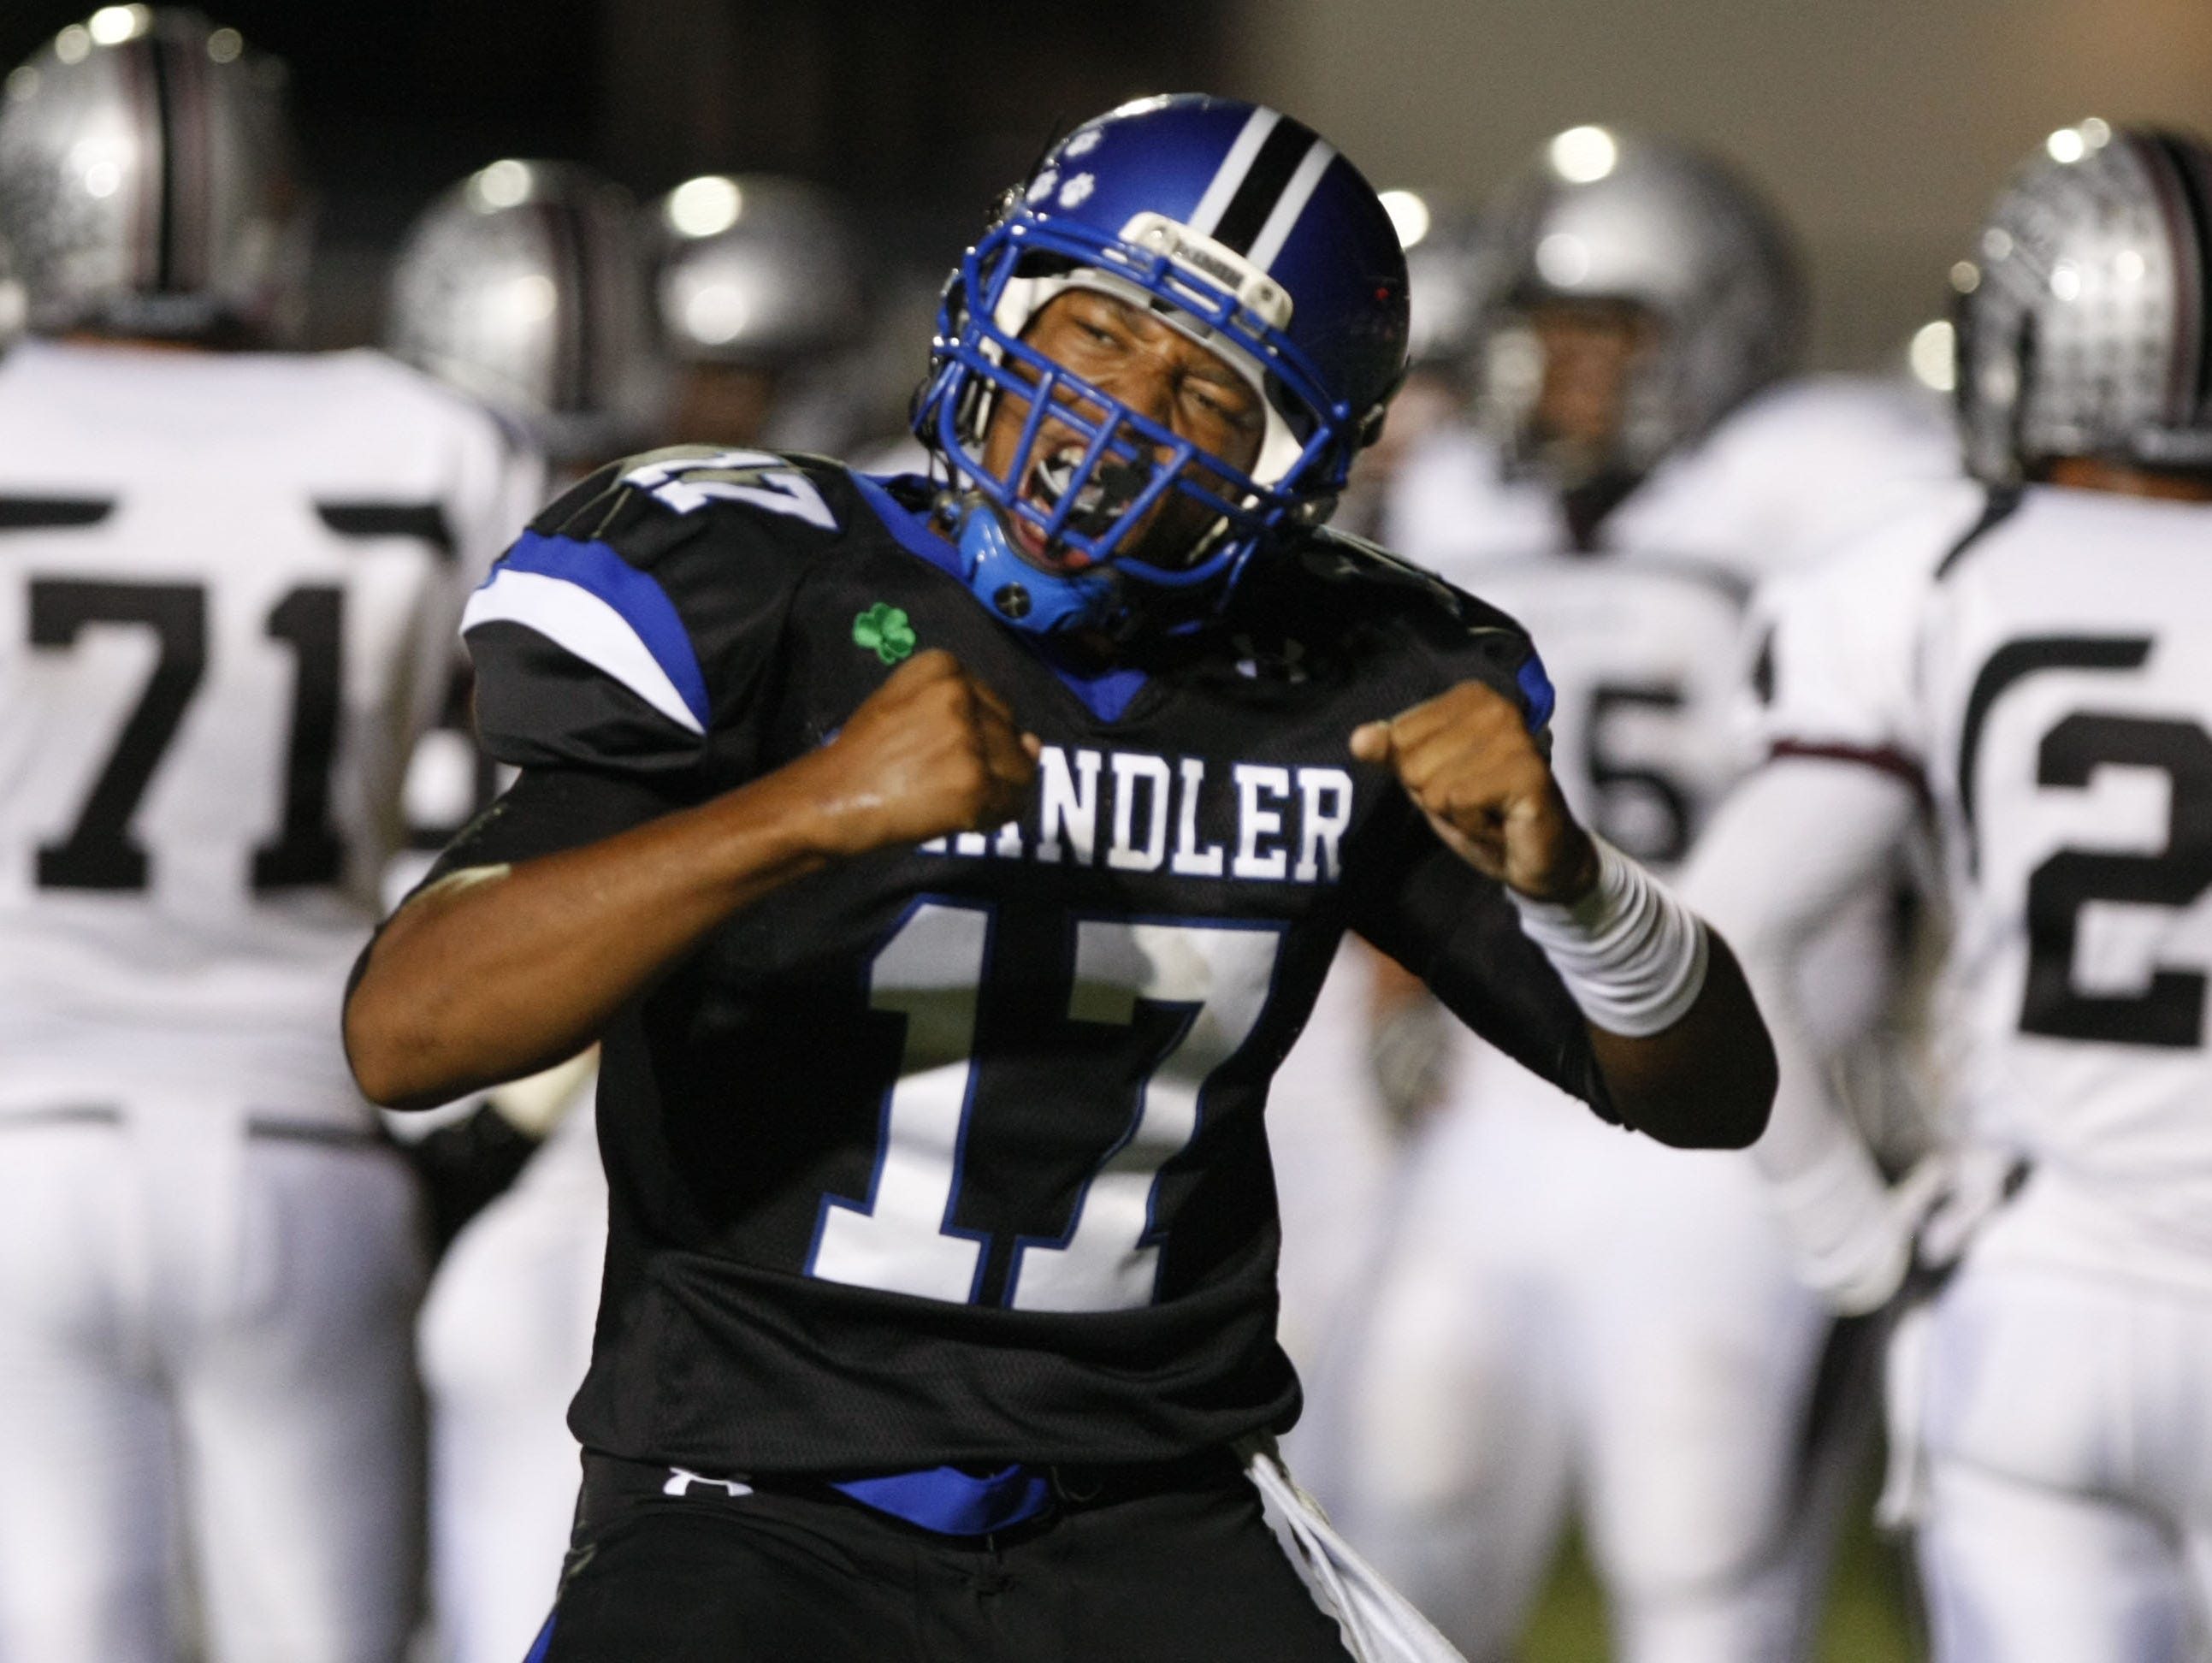 Chandler High quarterback Brett Hundley celebrates after scoring a touchdown against Hamilton High during the 2010 season.